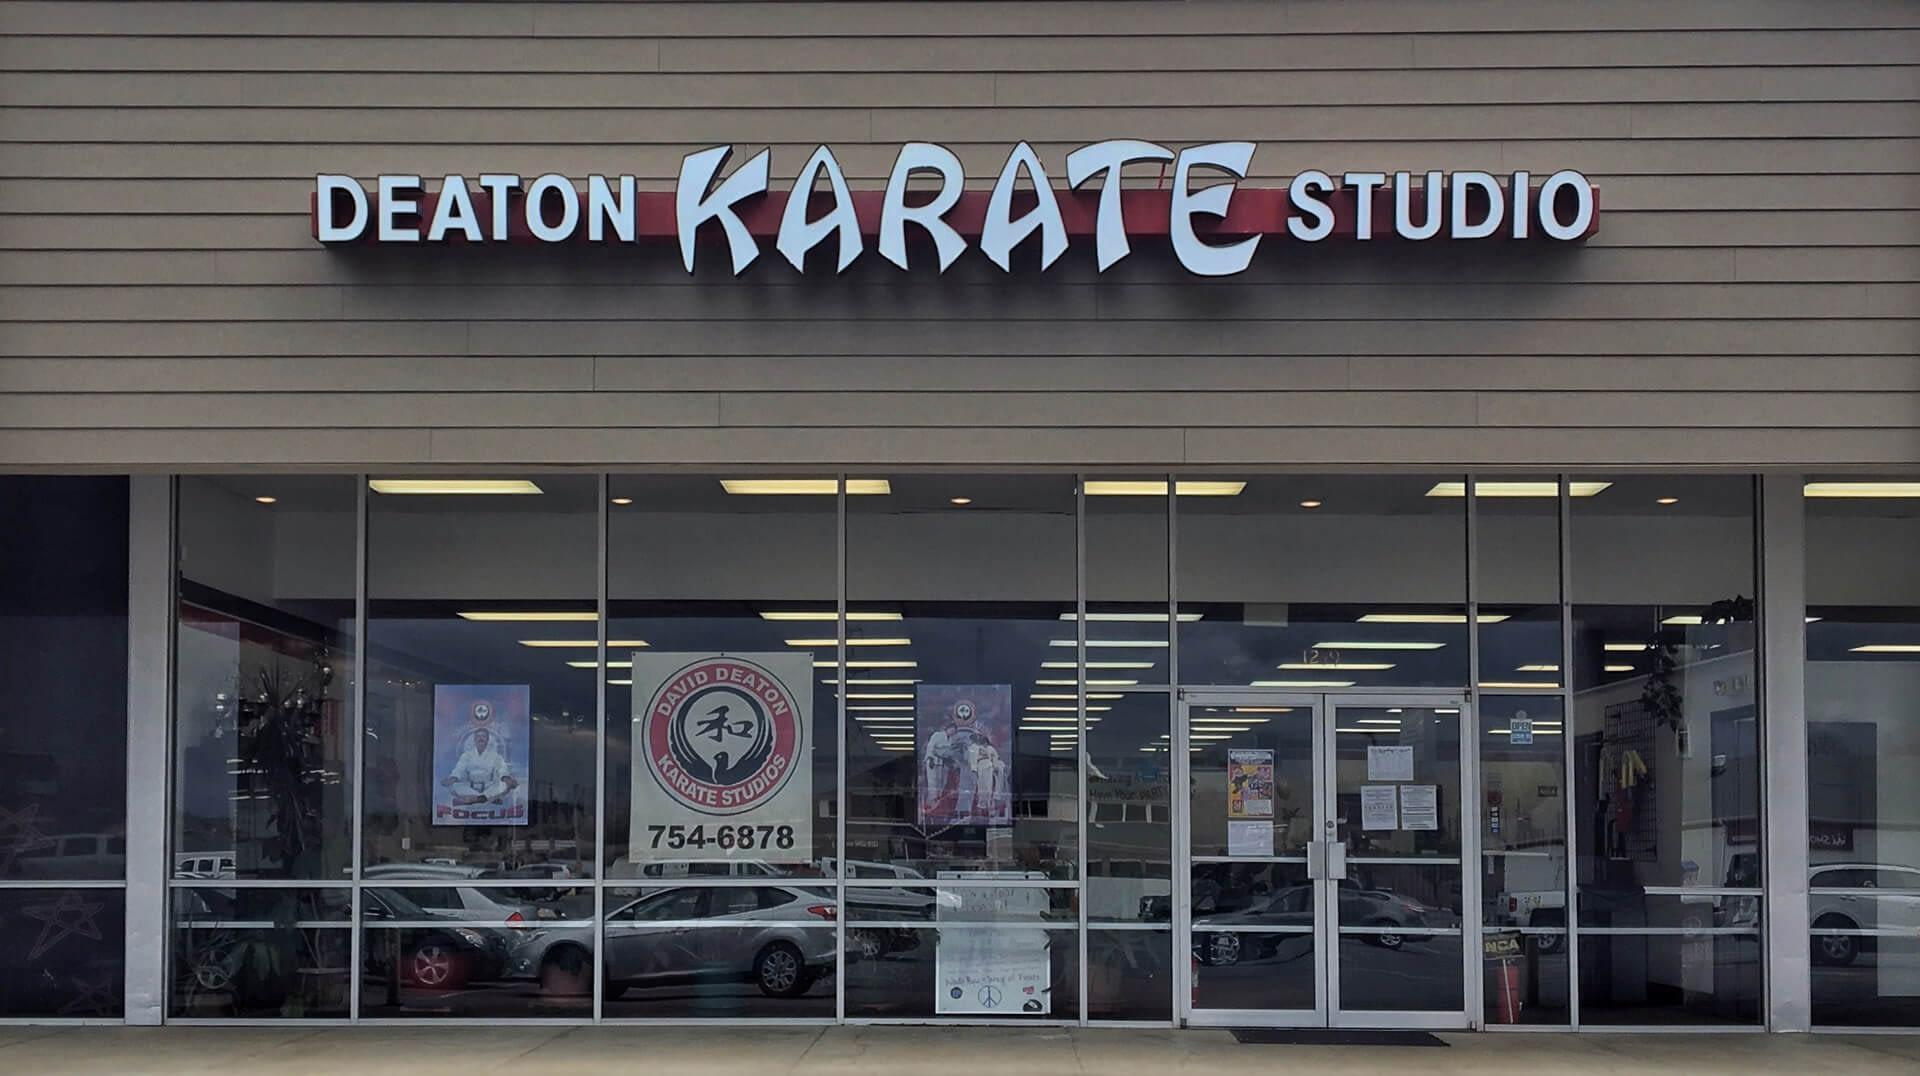 Deaton Karate Studios Mount Juliet TN